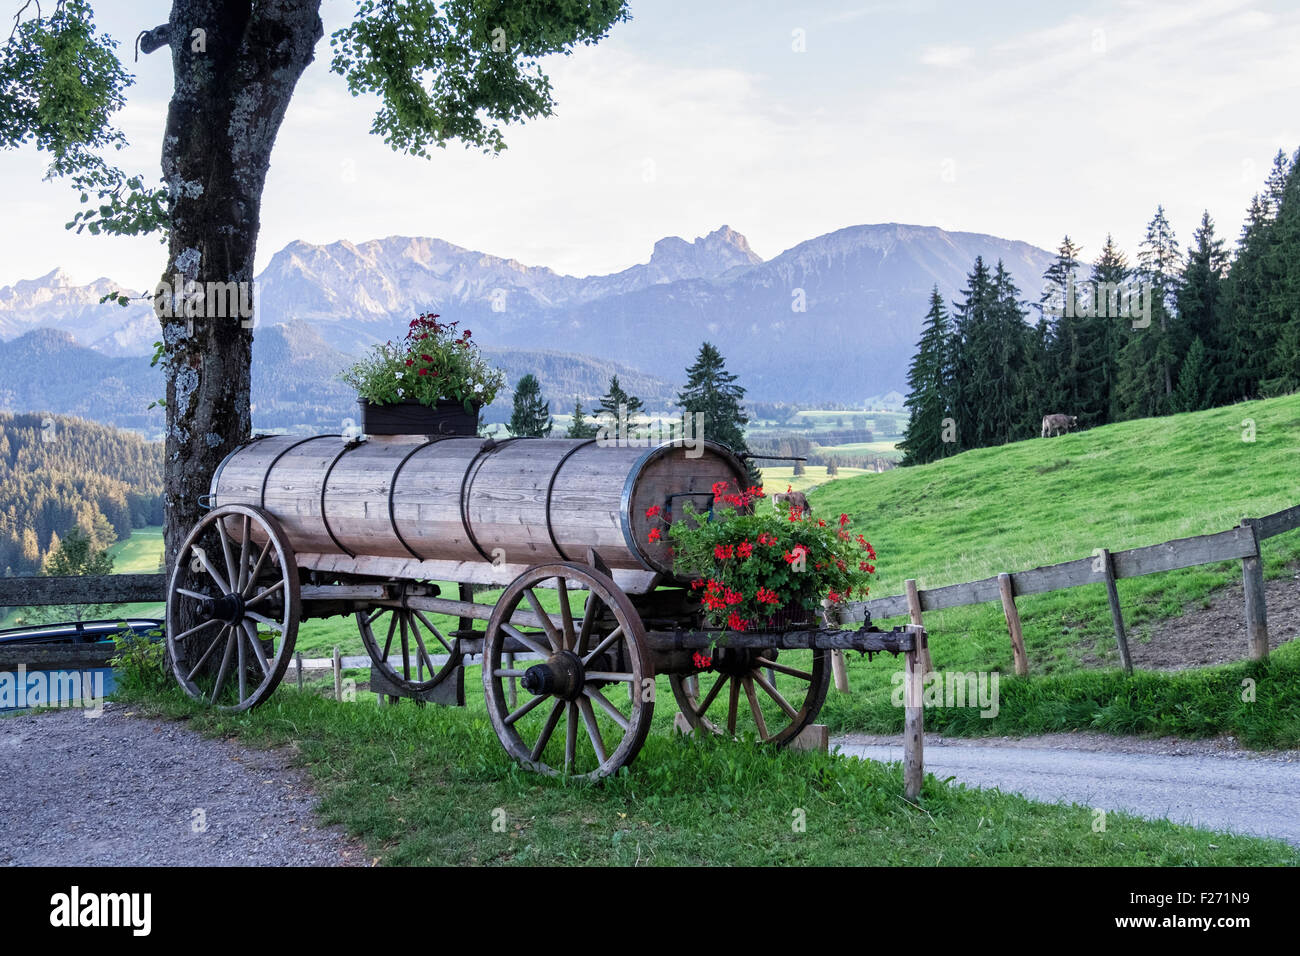 Bavarian Alps, Old Wagon farm land, trees, mountains and sky, Eastern Allgaü, Bavaria, Germany - Stock Image